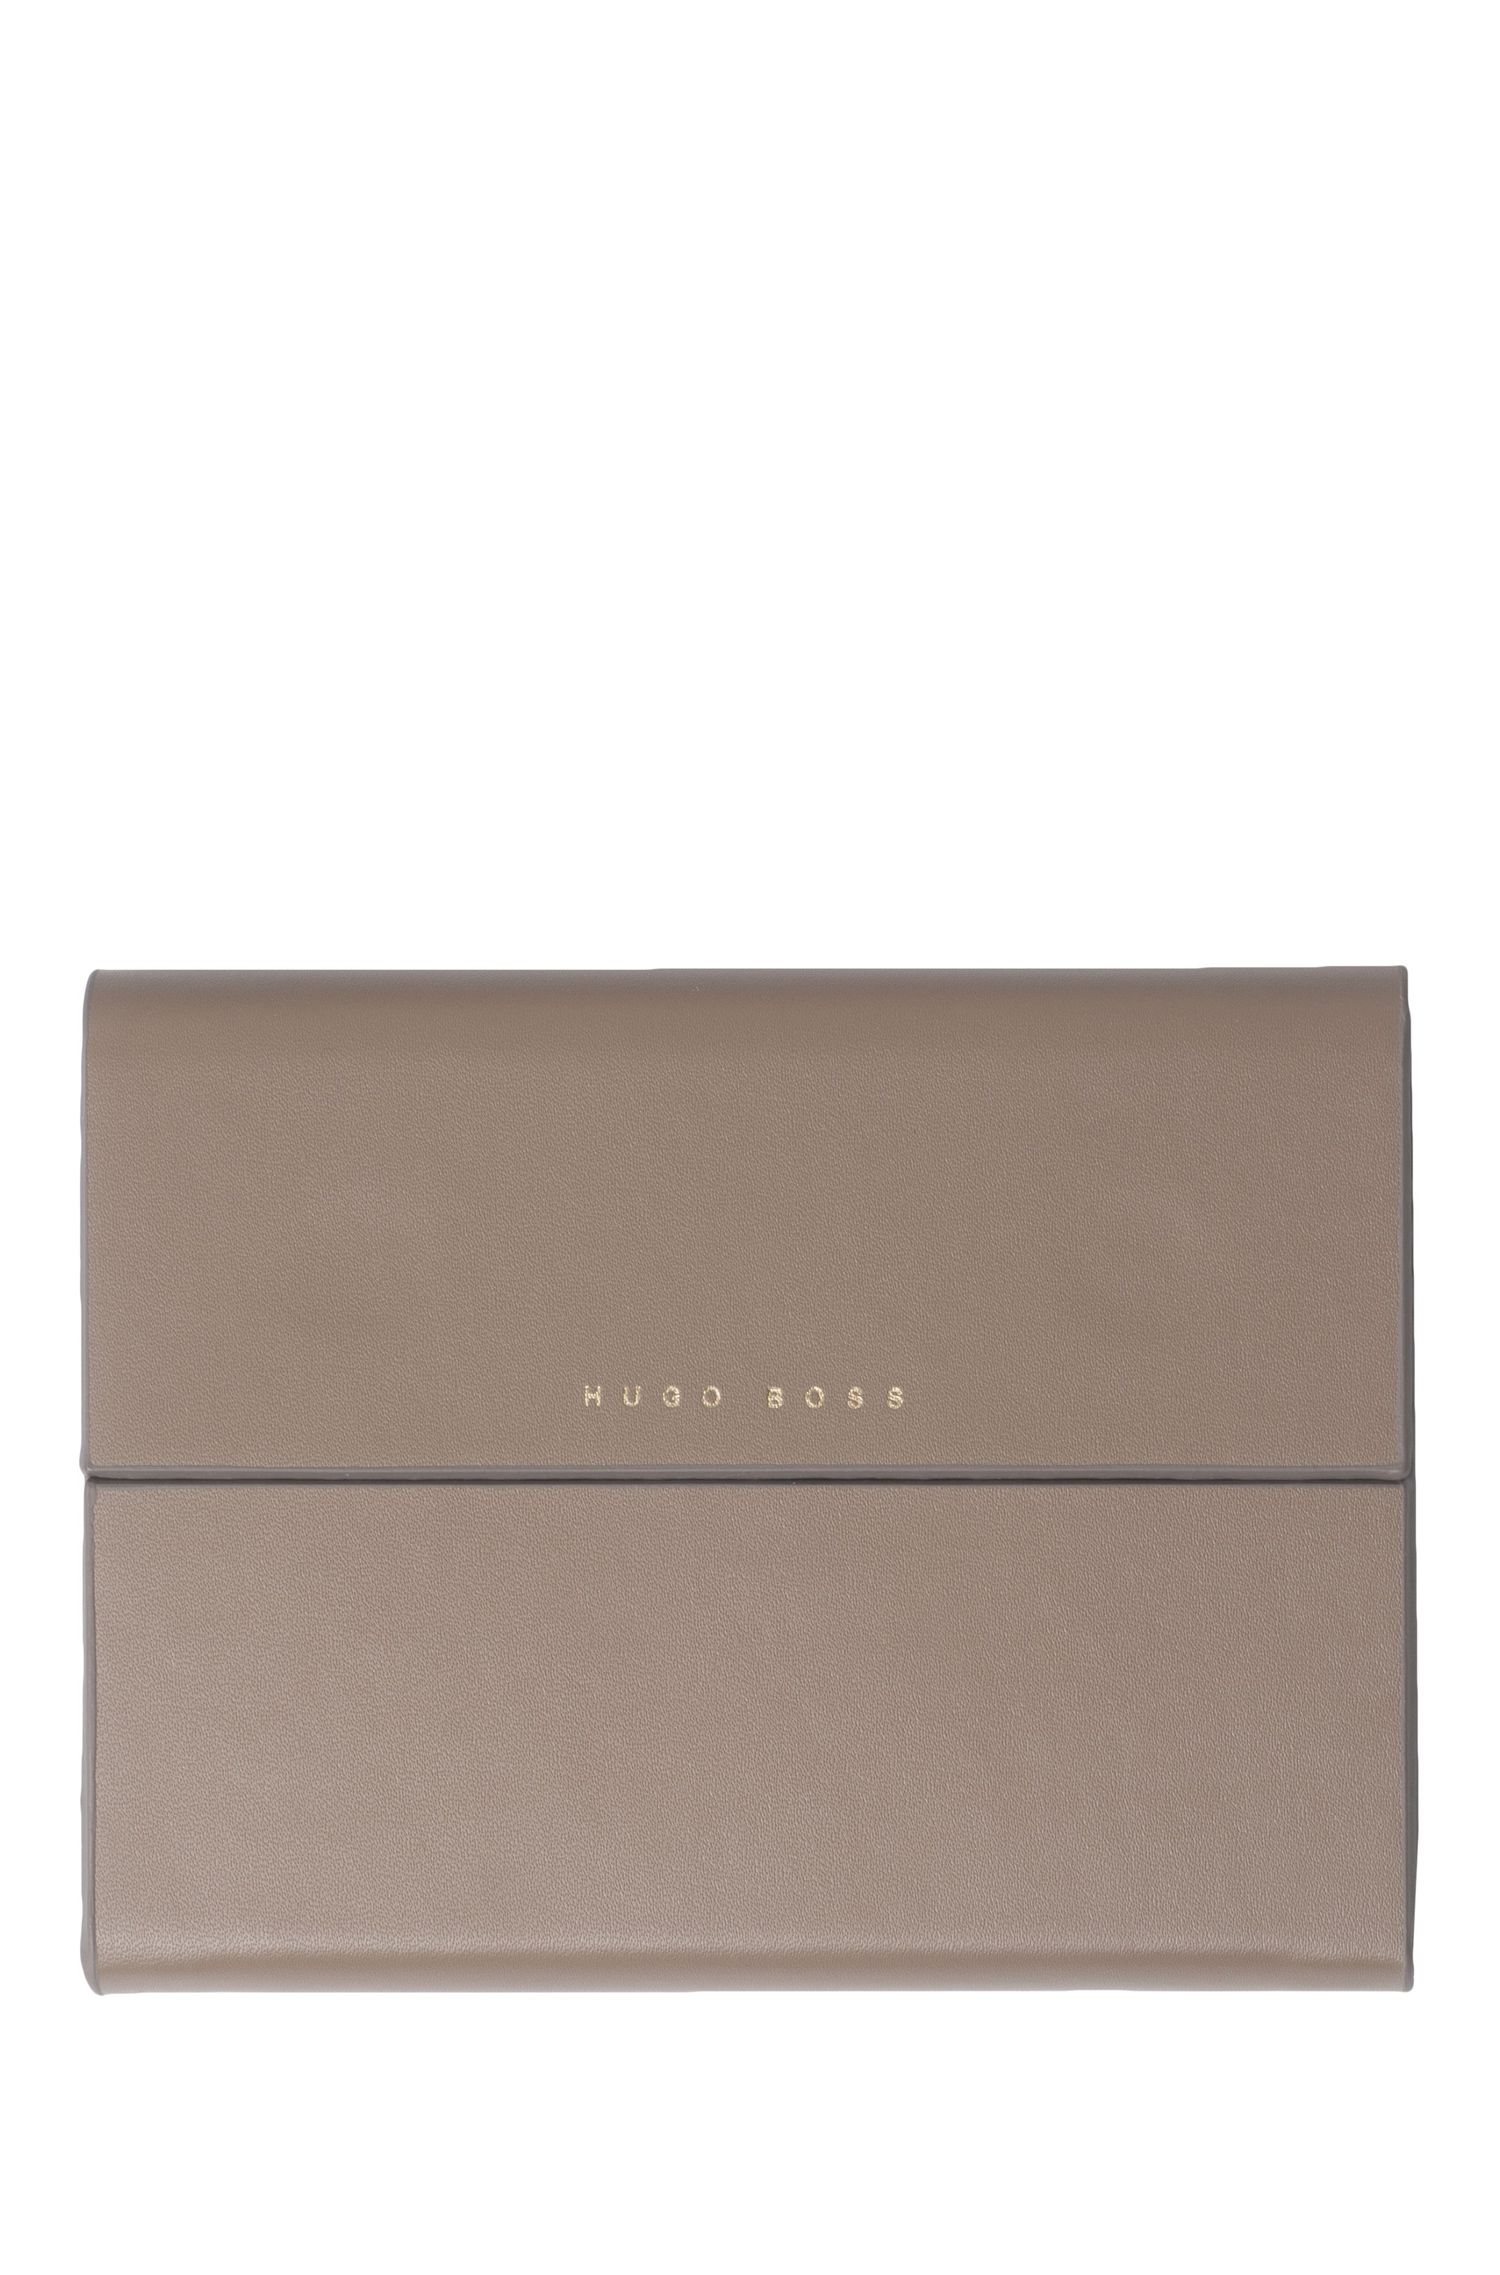 Notizbuch aus strukturiertem Kunstleder